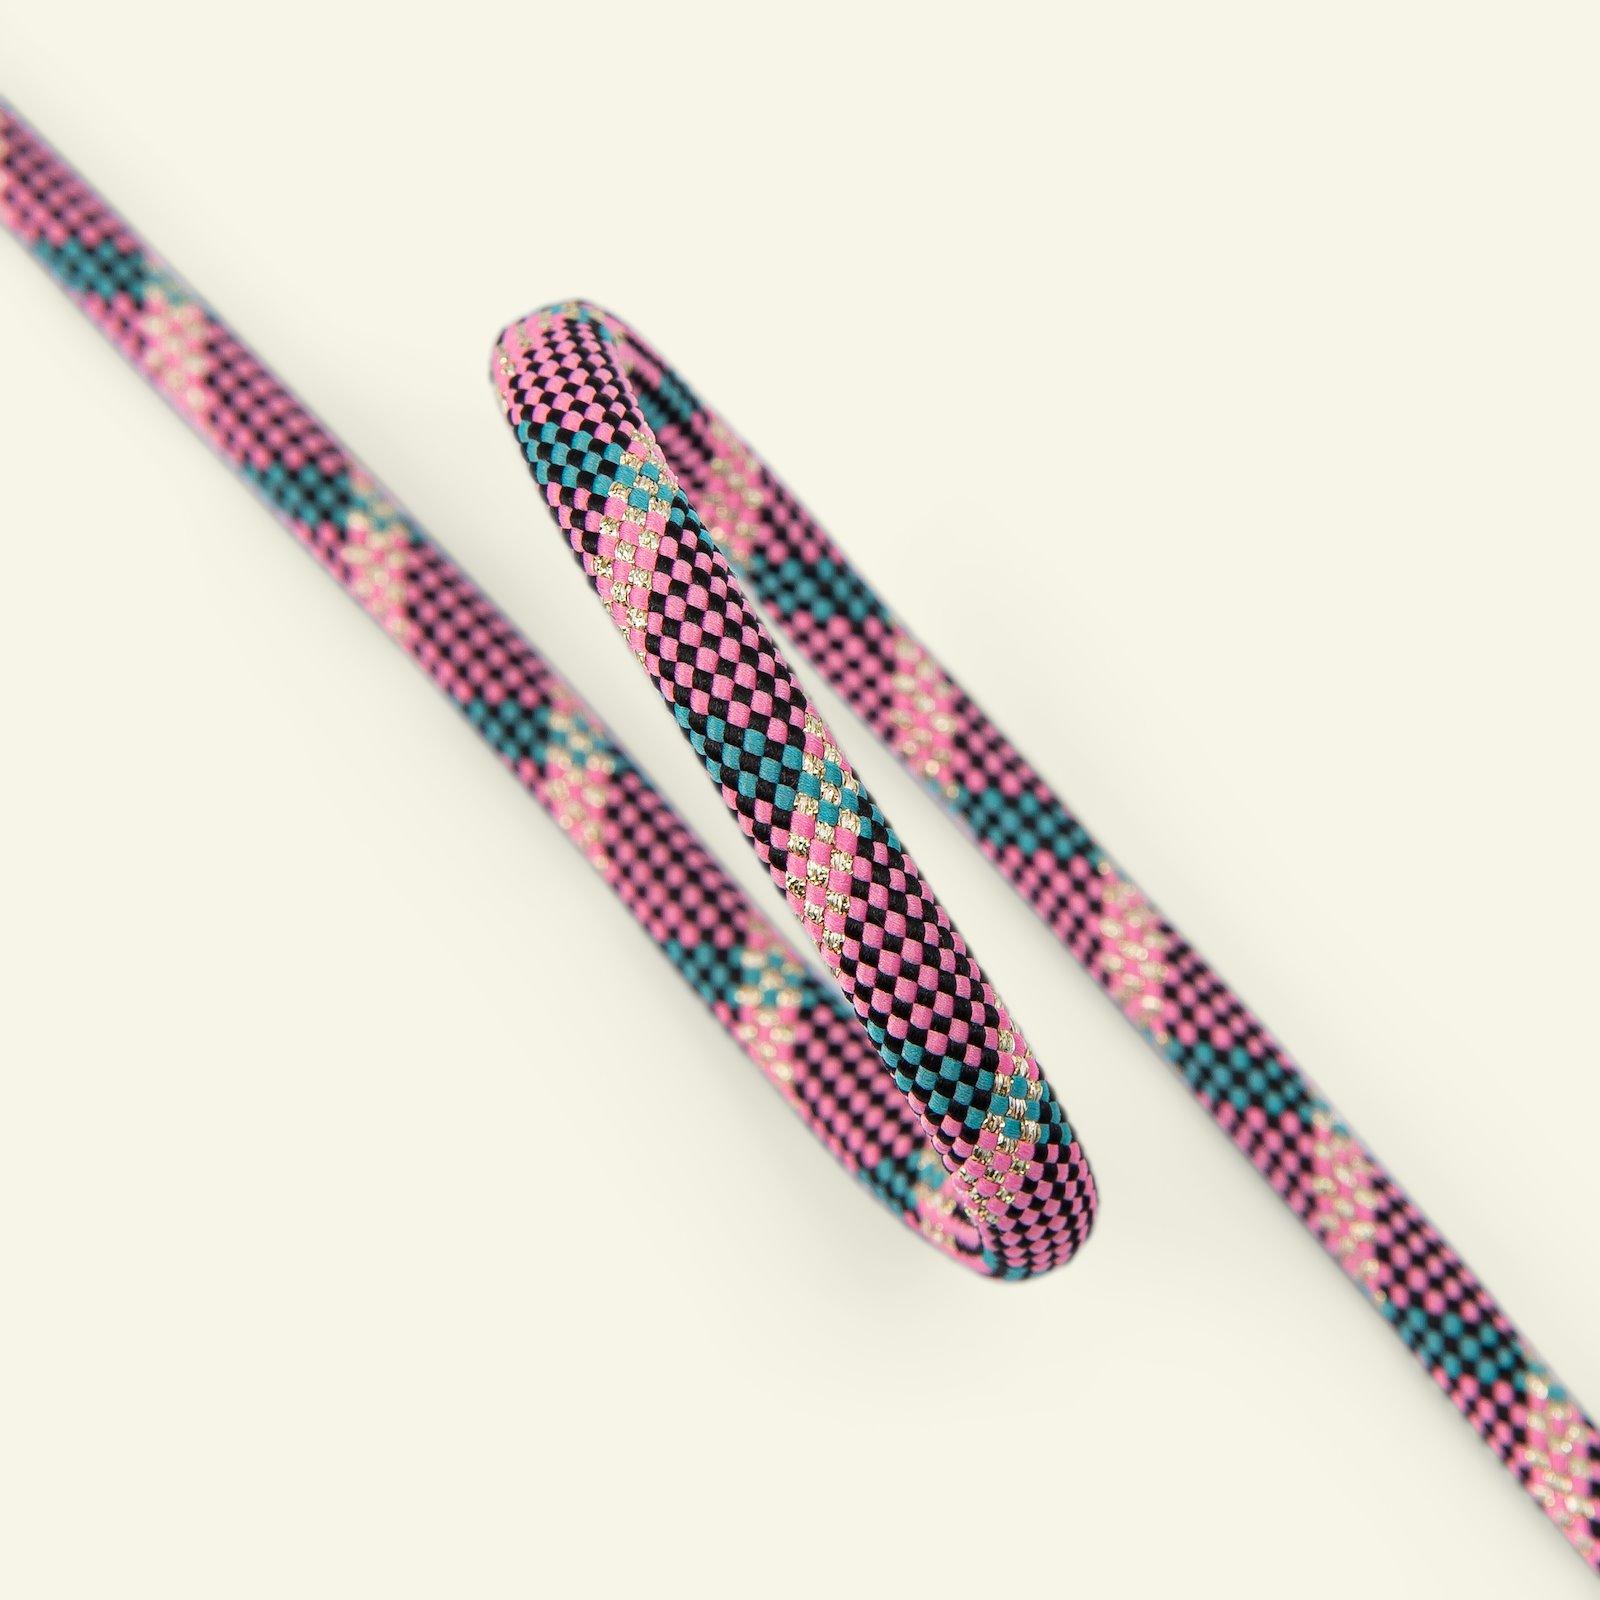 Parachute cord check 8mm rose/petrol 3m 22279_pack